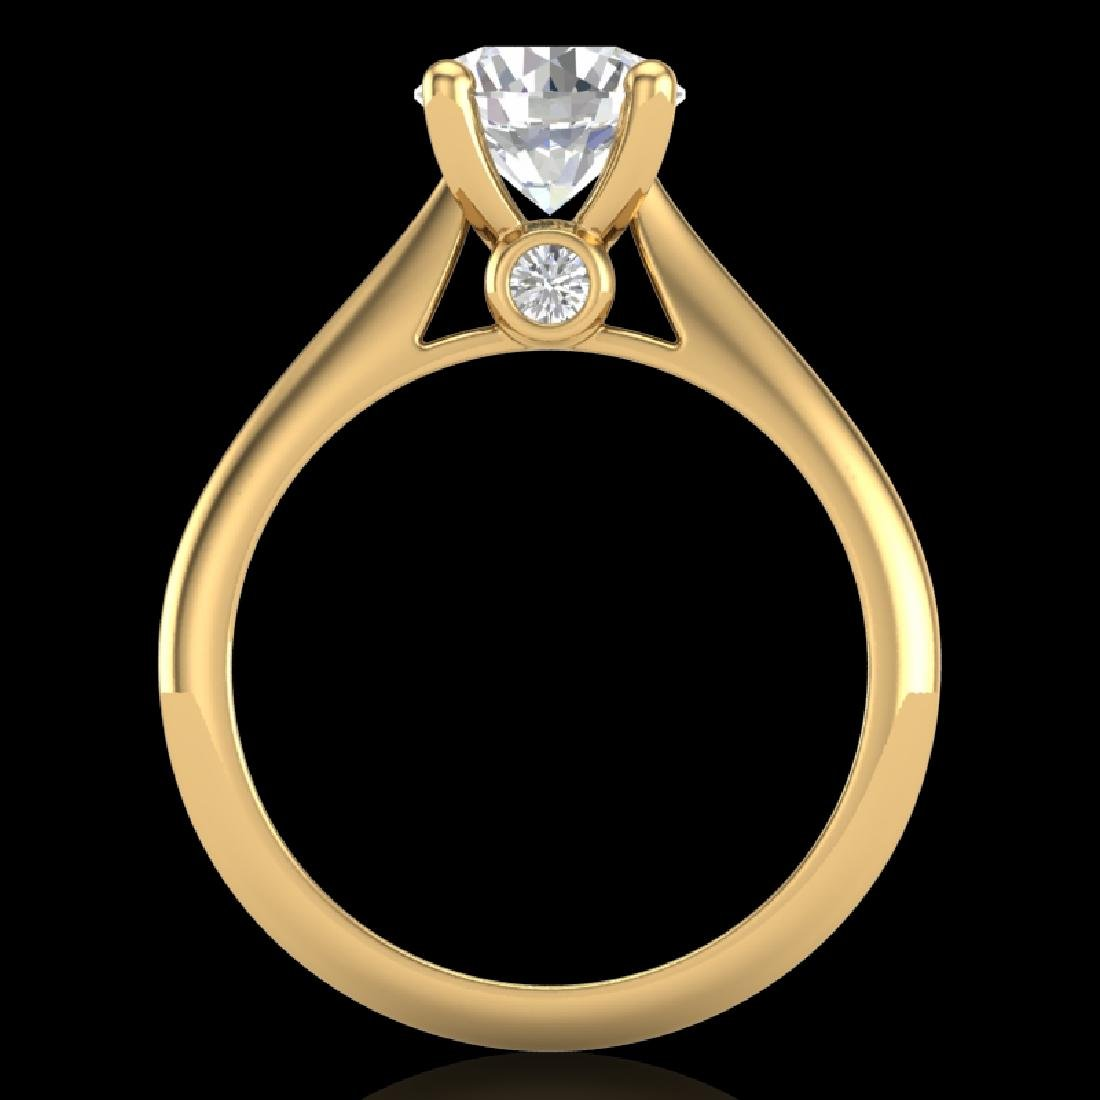 1.6 CTW VS/SI Diamond Art Deco Ring 18K Yellow Gold - 3